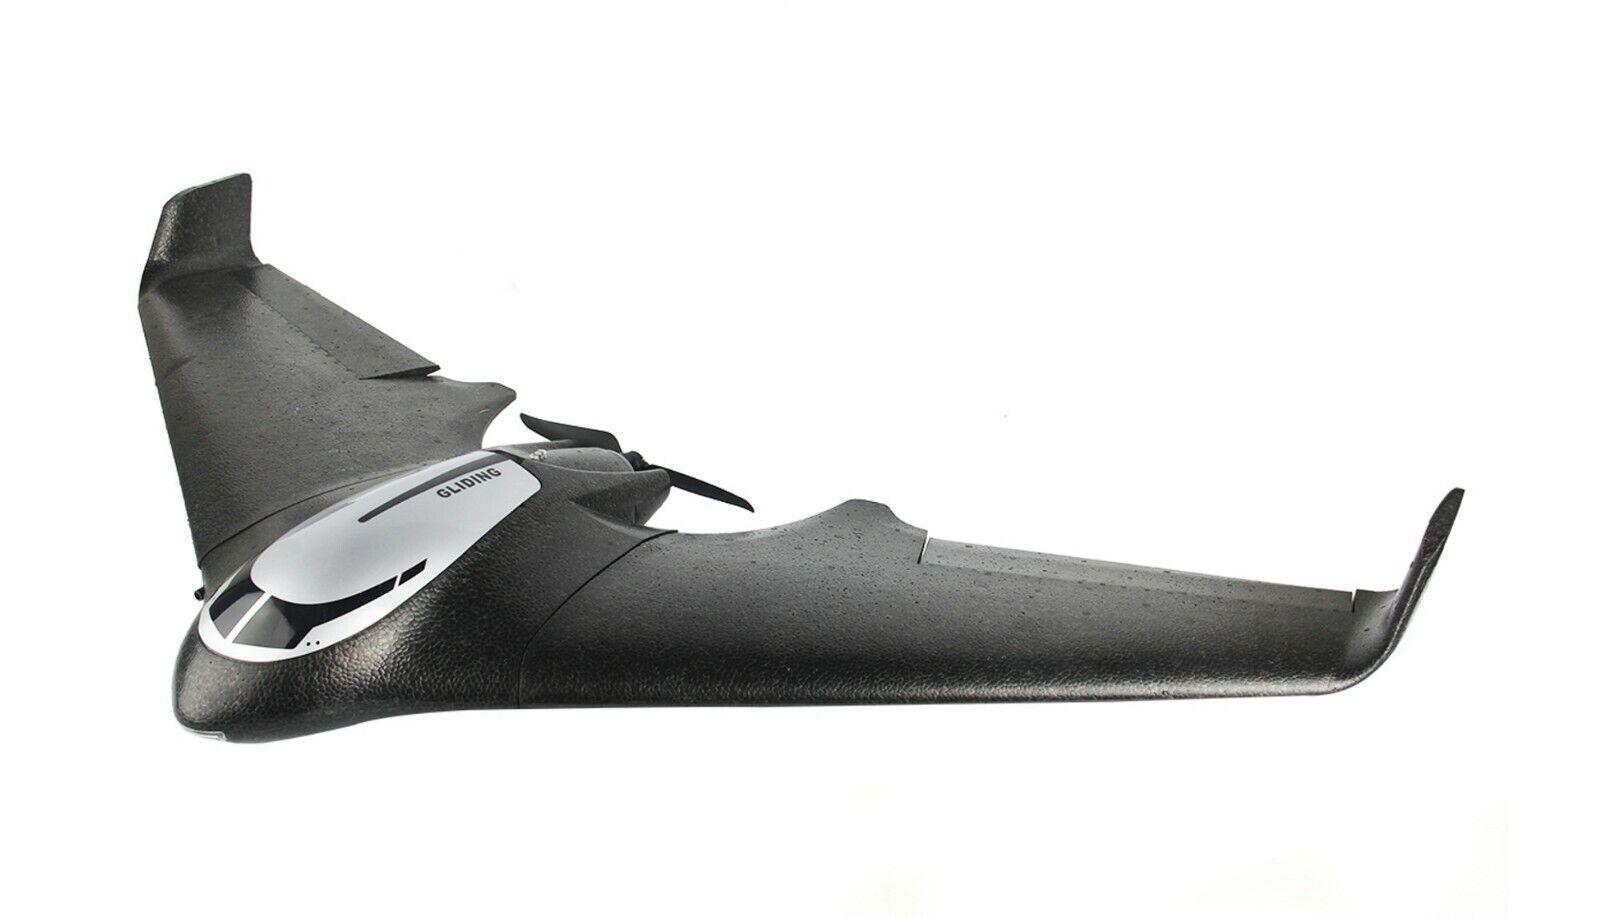 RC Flugzeug Motorflugzeug Smart A.I. 1500 FPV Gleiter EPO, 2,4GHz mit GPS RTF